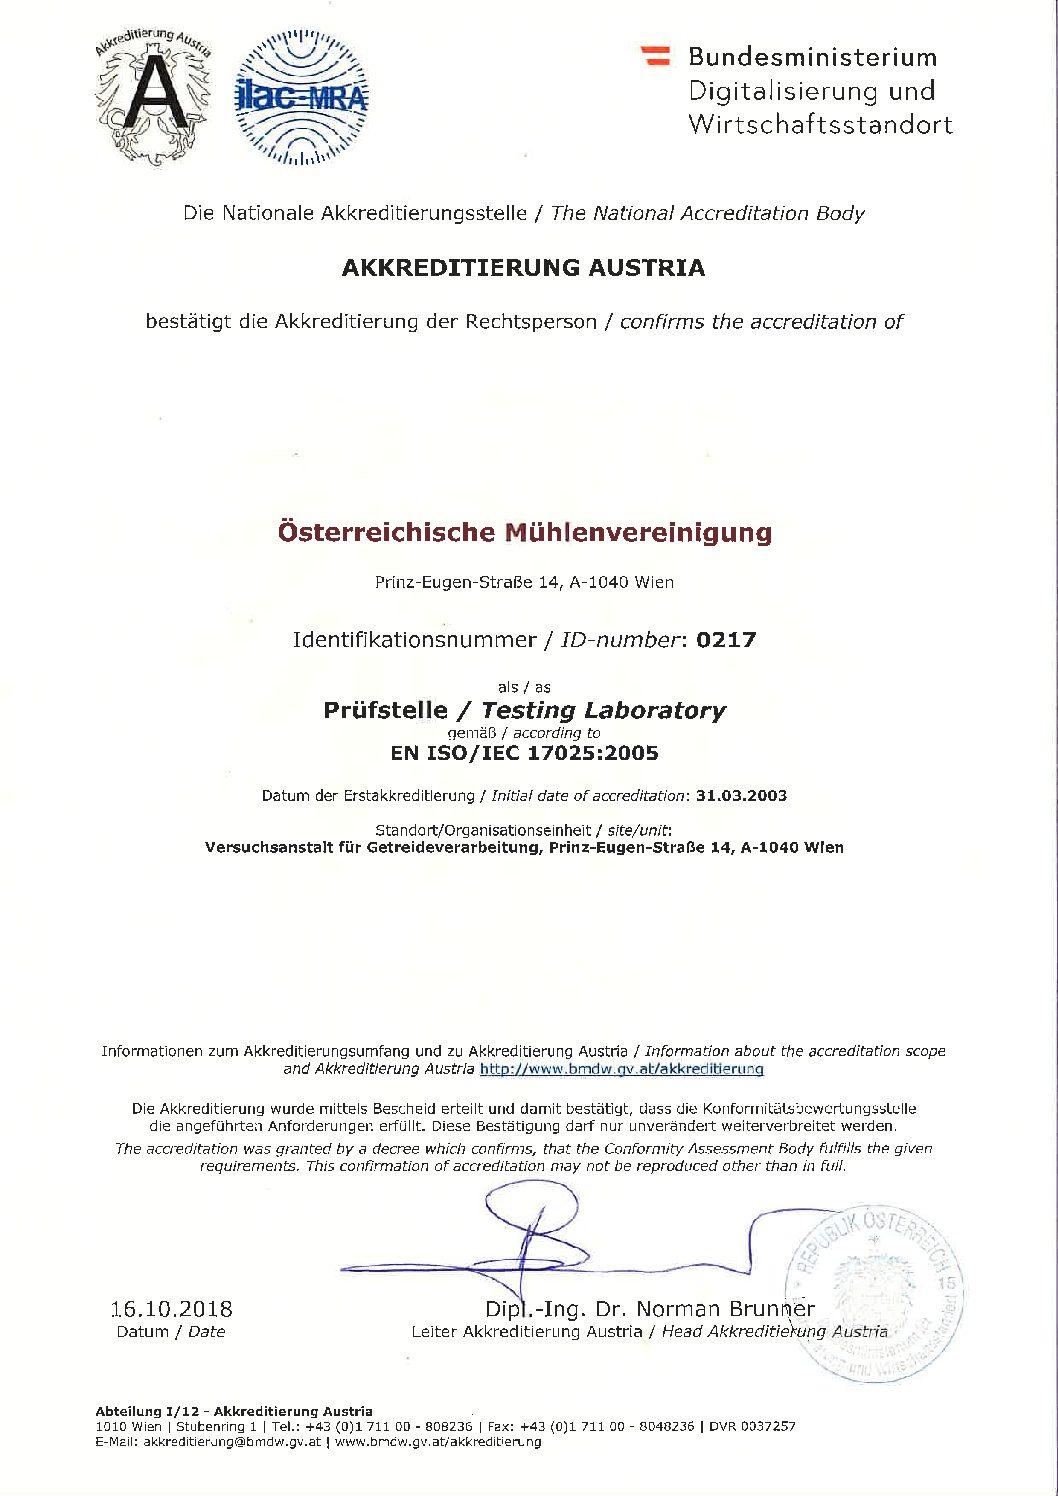 Accreditation VG